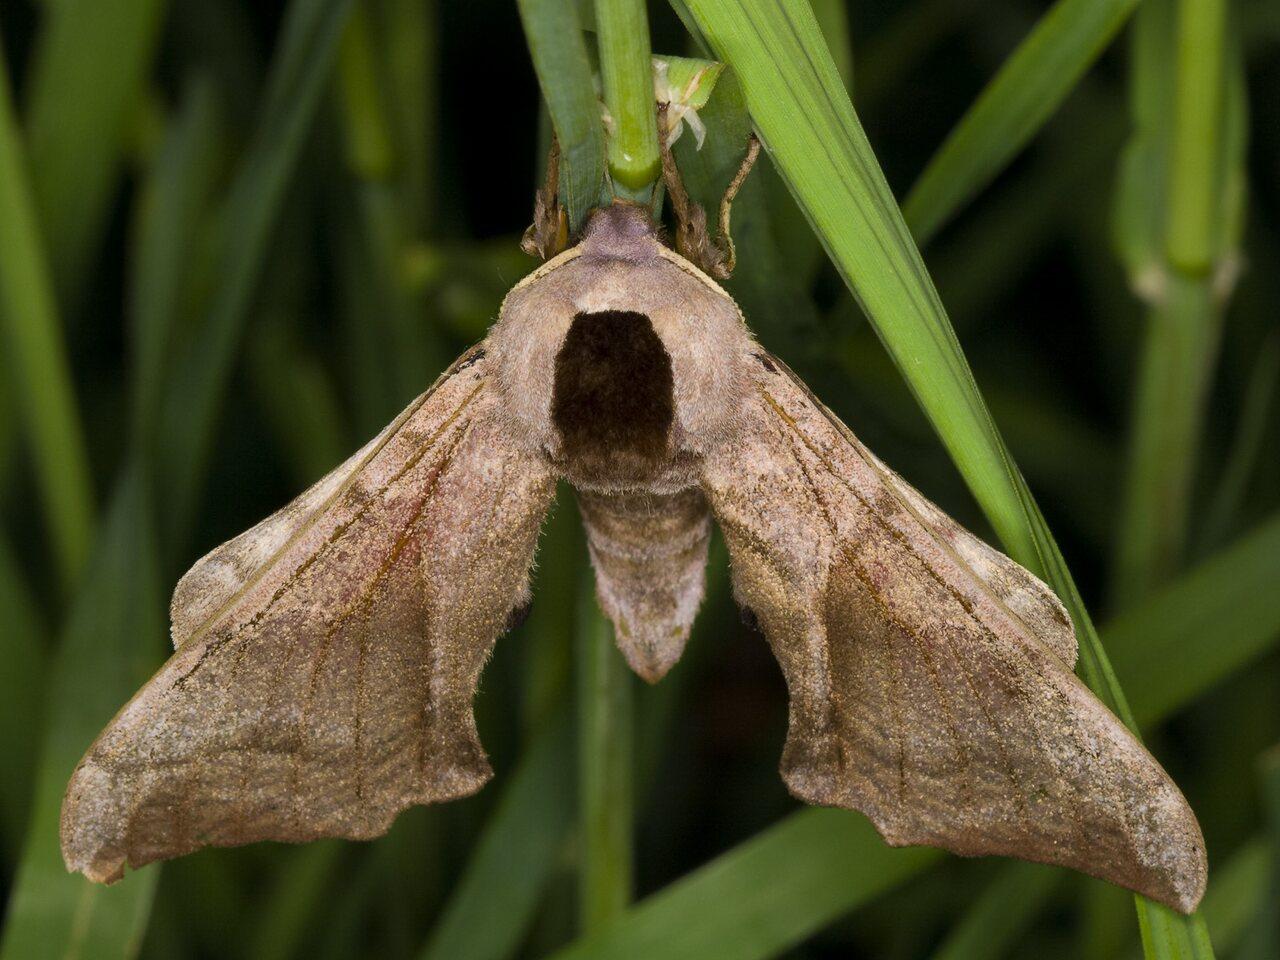 Smerinthus-ocellatus-3286.jpg